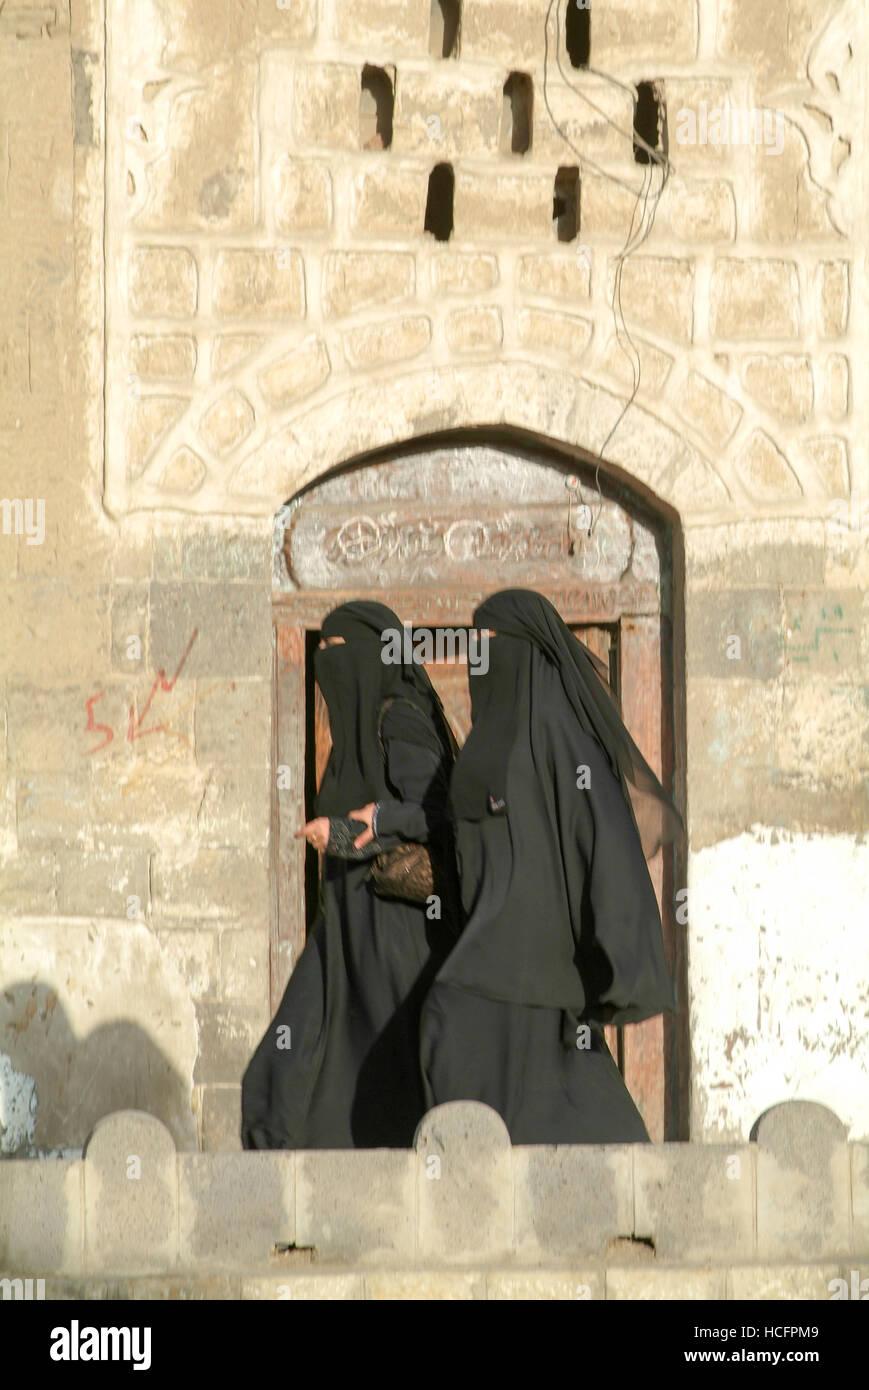 Sana, Yemen - 19 January 2008: women wearing the burqa and walking on the street of old Sana, Yemen - Stock Image